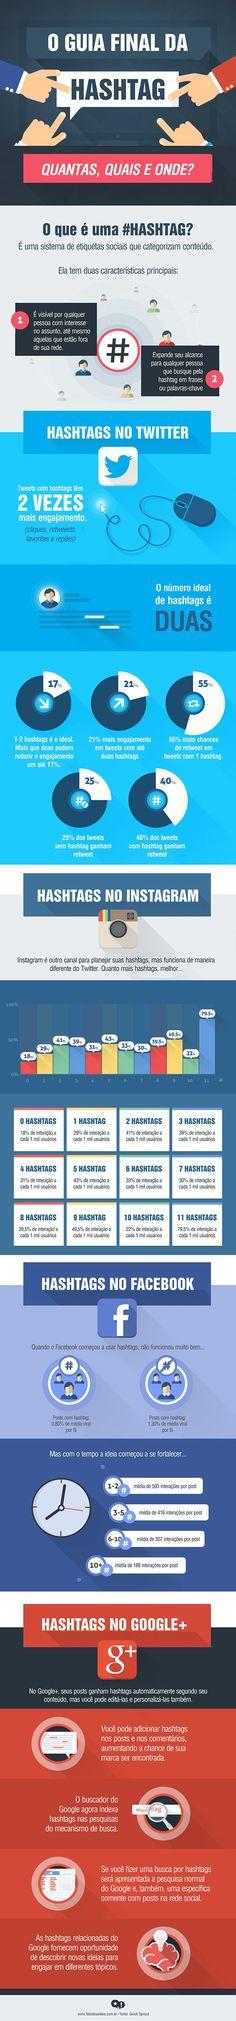 Infográfico: O Guia Final da Hashtag